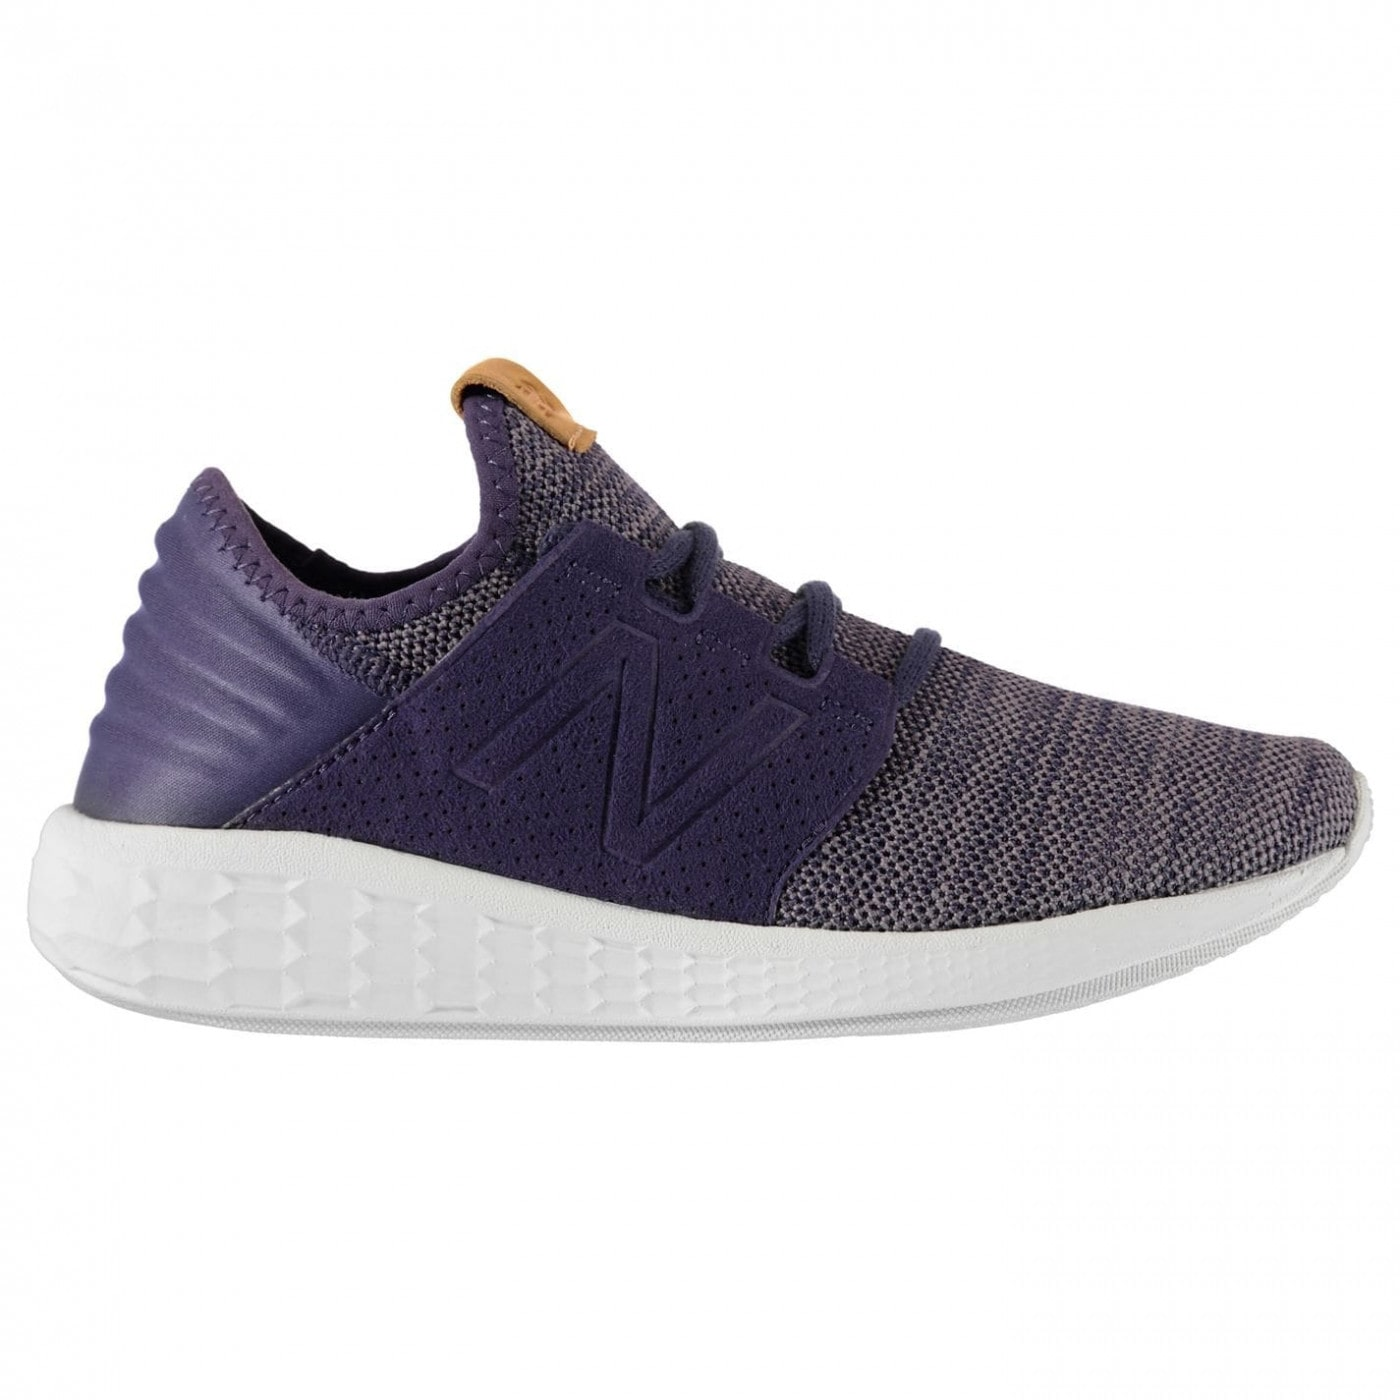 New Balance Fresh Foam Cruz V2 Nubuck Womens Running Shoes